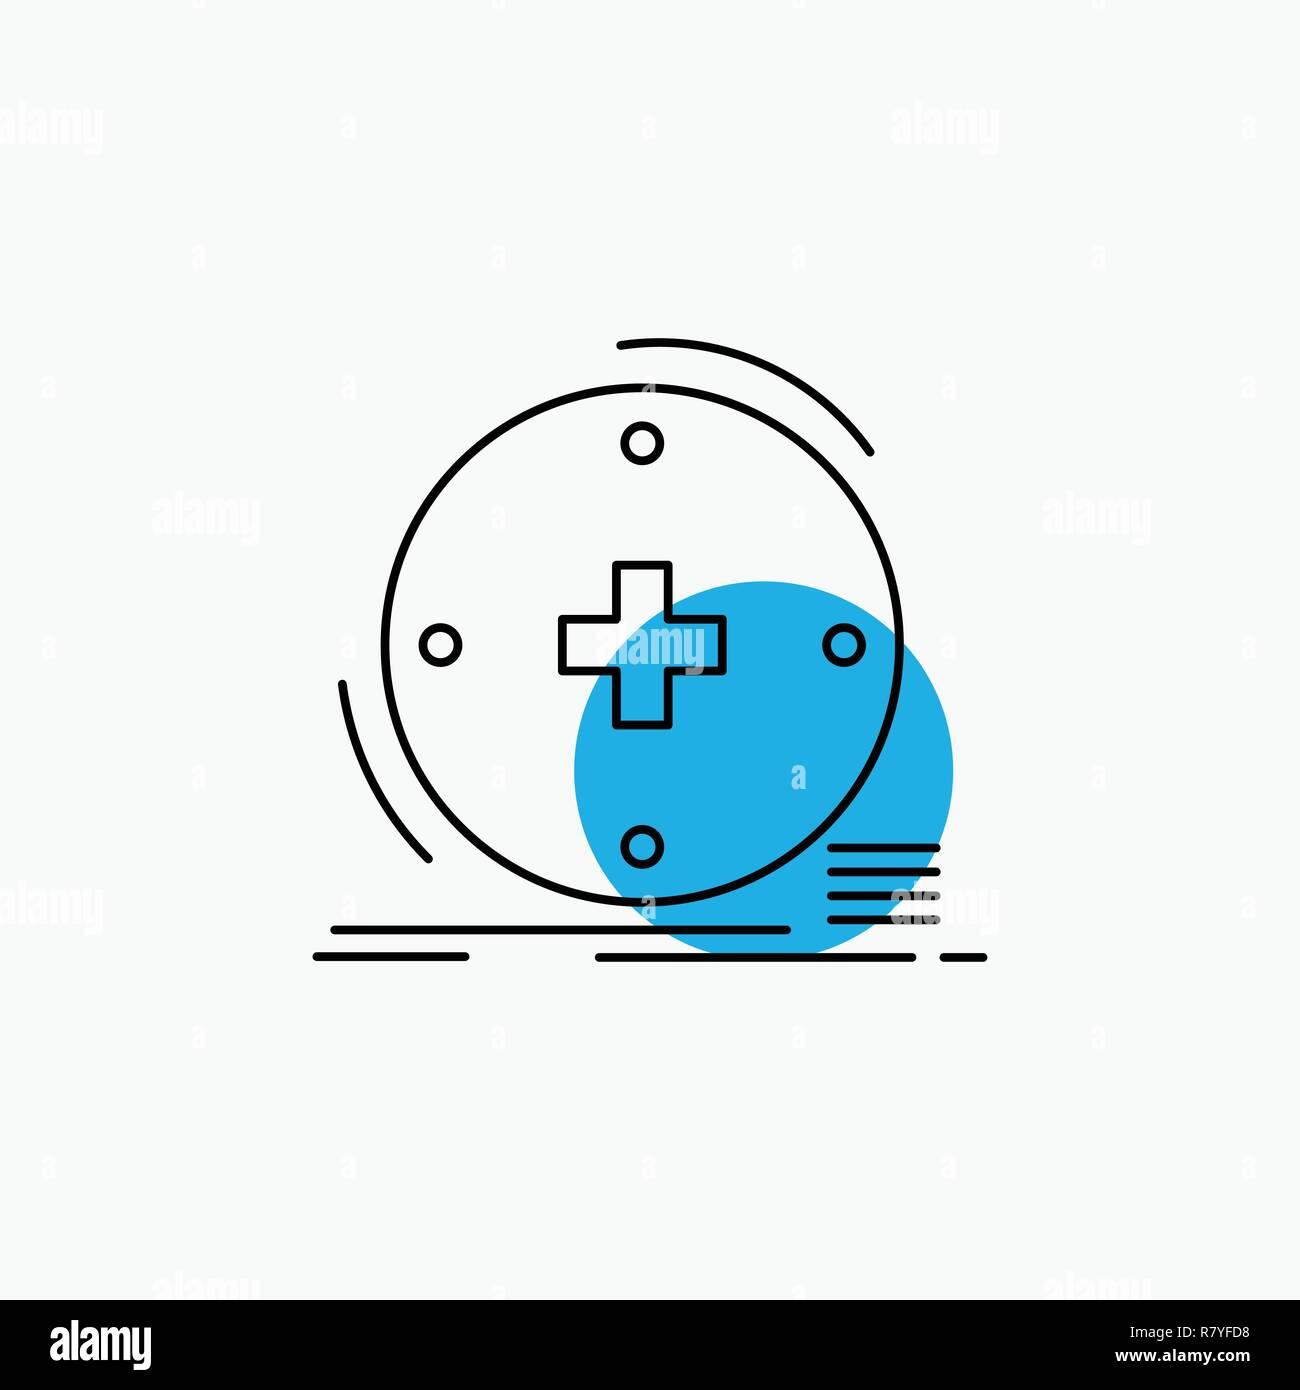 Clinical, digital, health, healthcare, telemedicine Line Icon - Stock Image